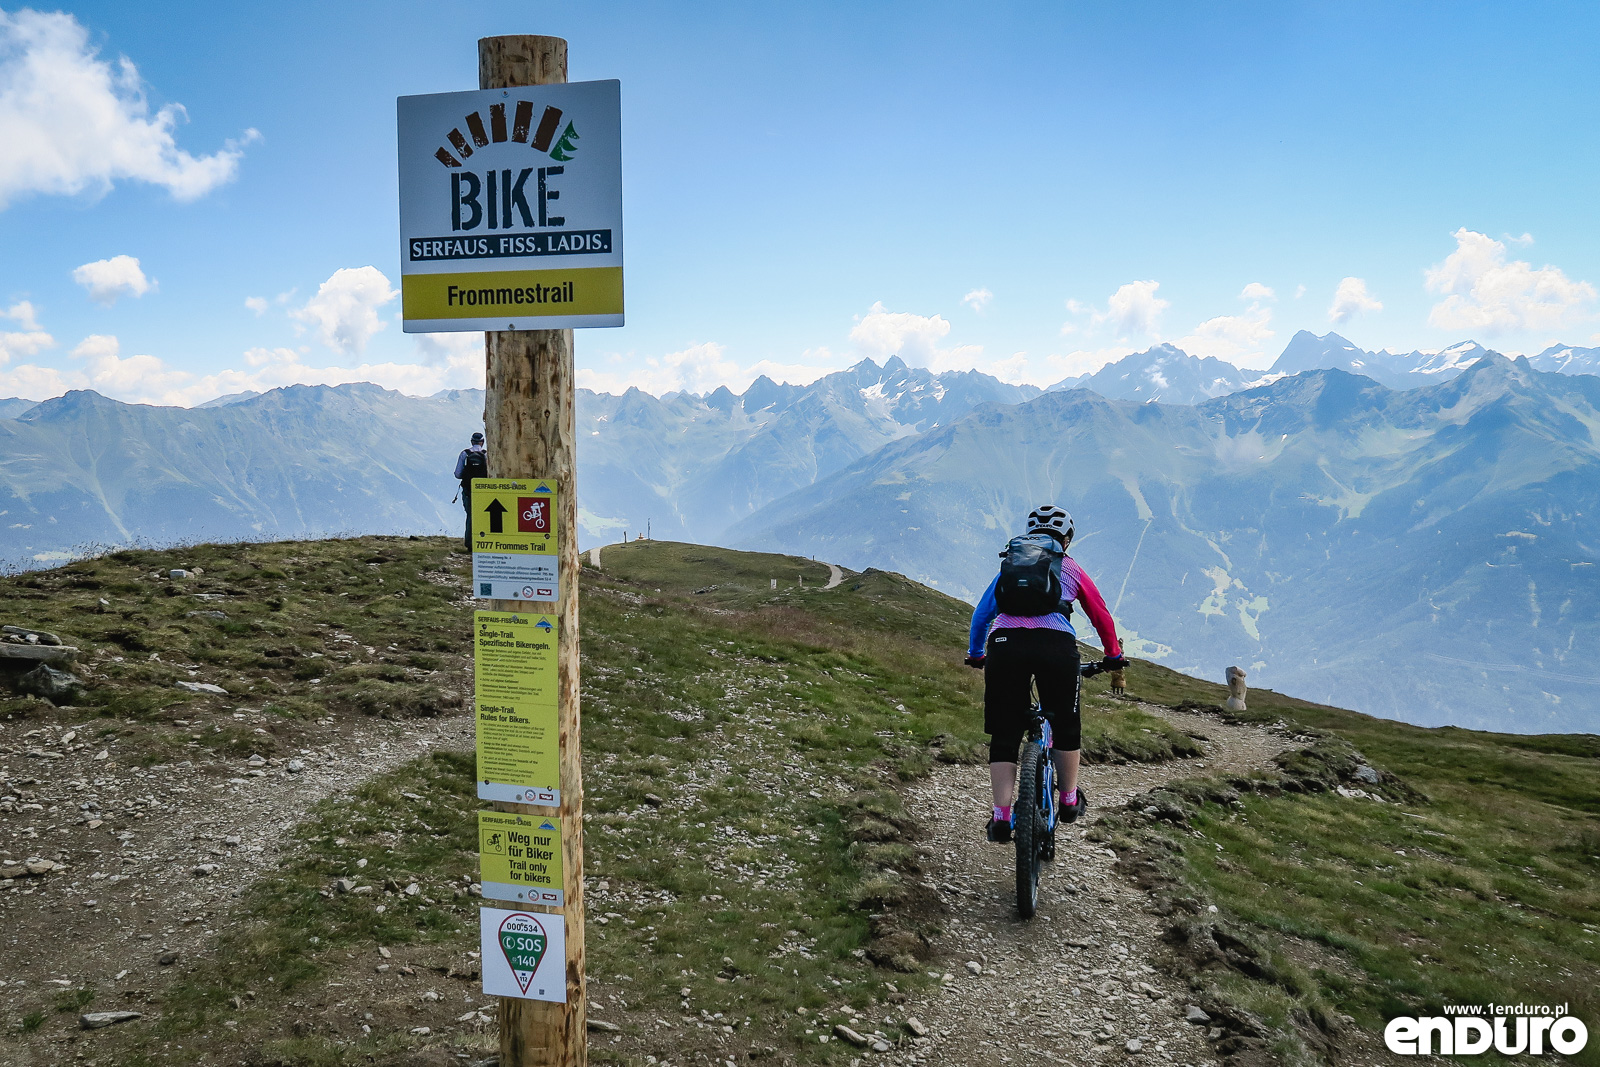 [Obrazek: bikepark-serfaus-fiss-ladis-12.jpg]